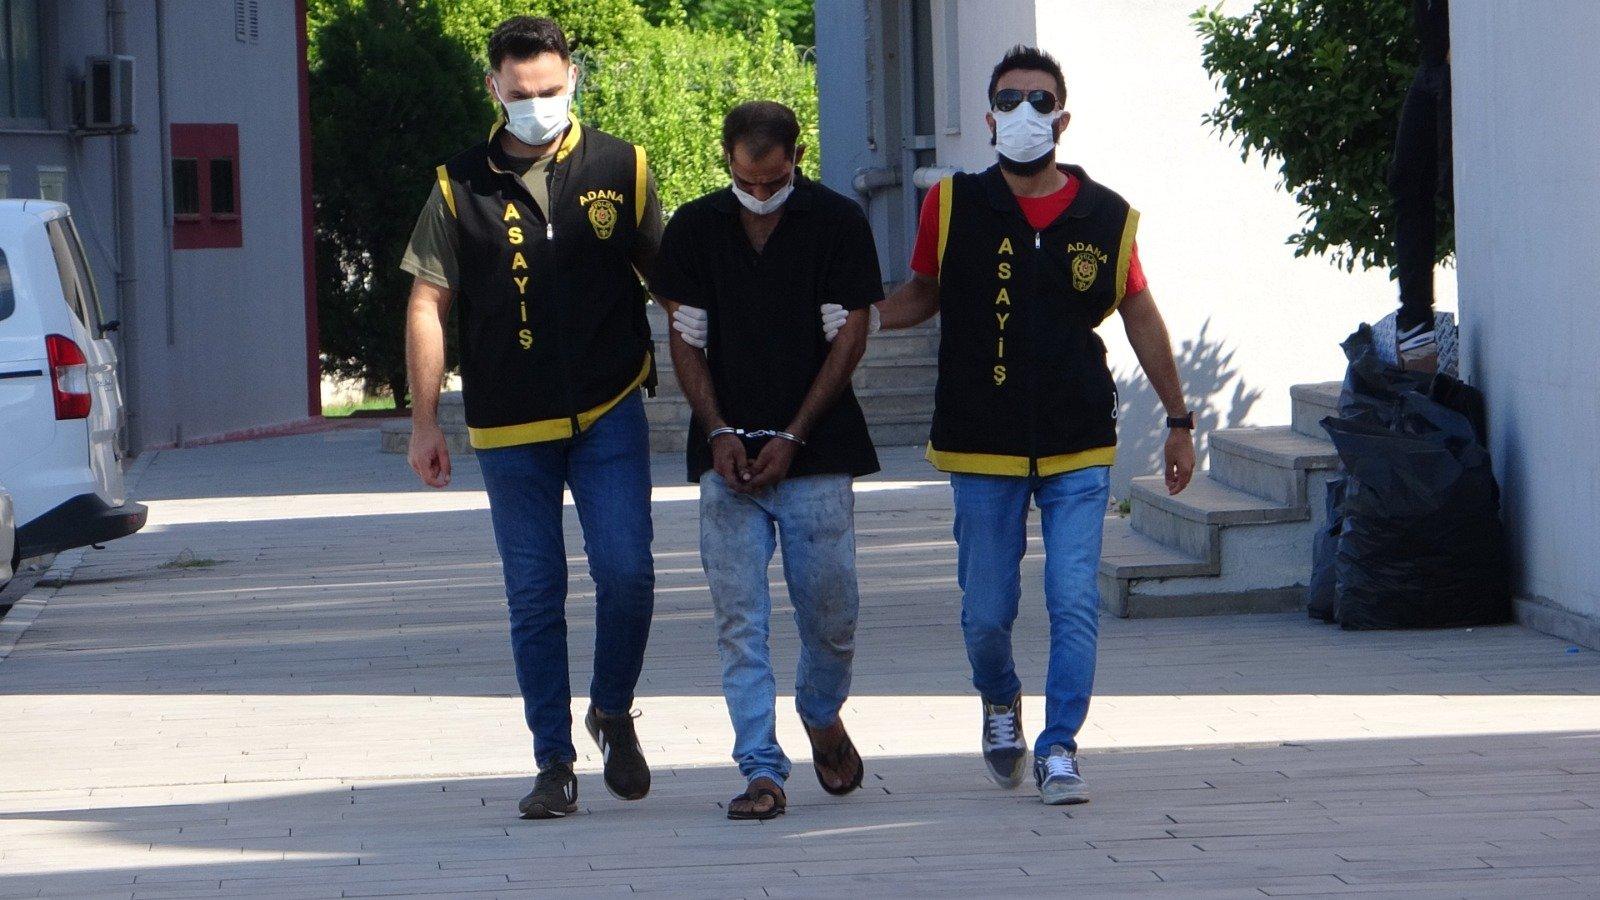 Police escort suspected car thief C.A. in Adana, southern Turkey, Aug. 20, 2021. (Photo by Ziya Ramoğlu)